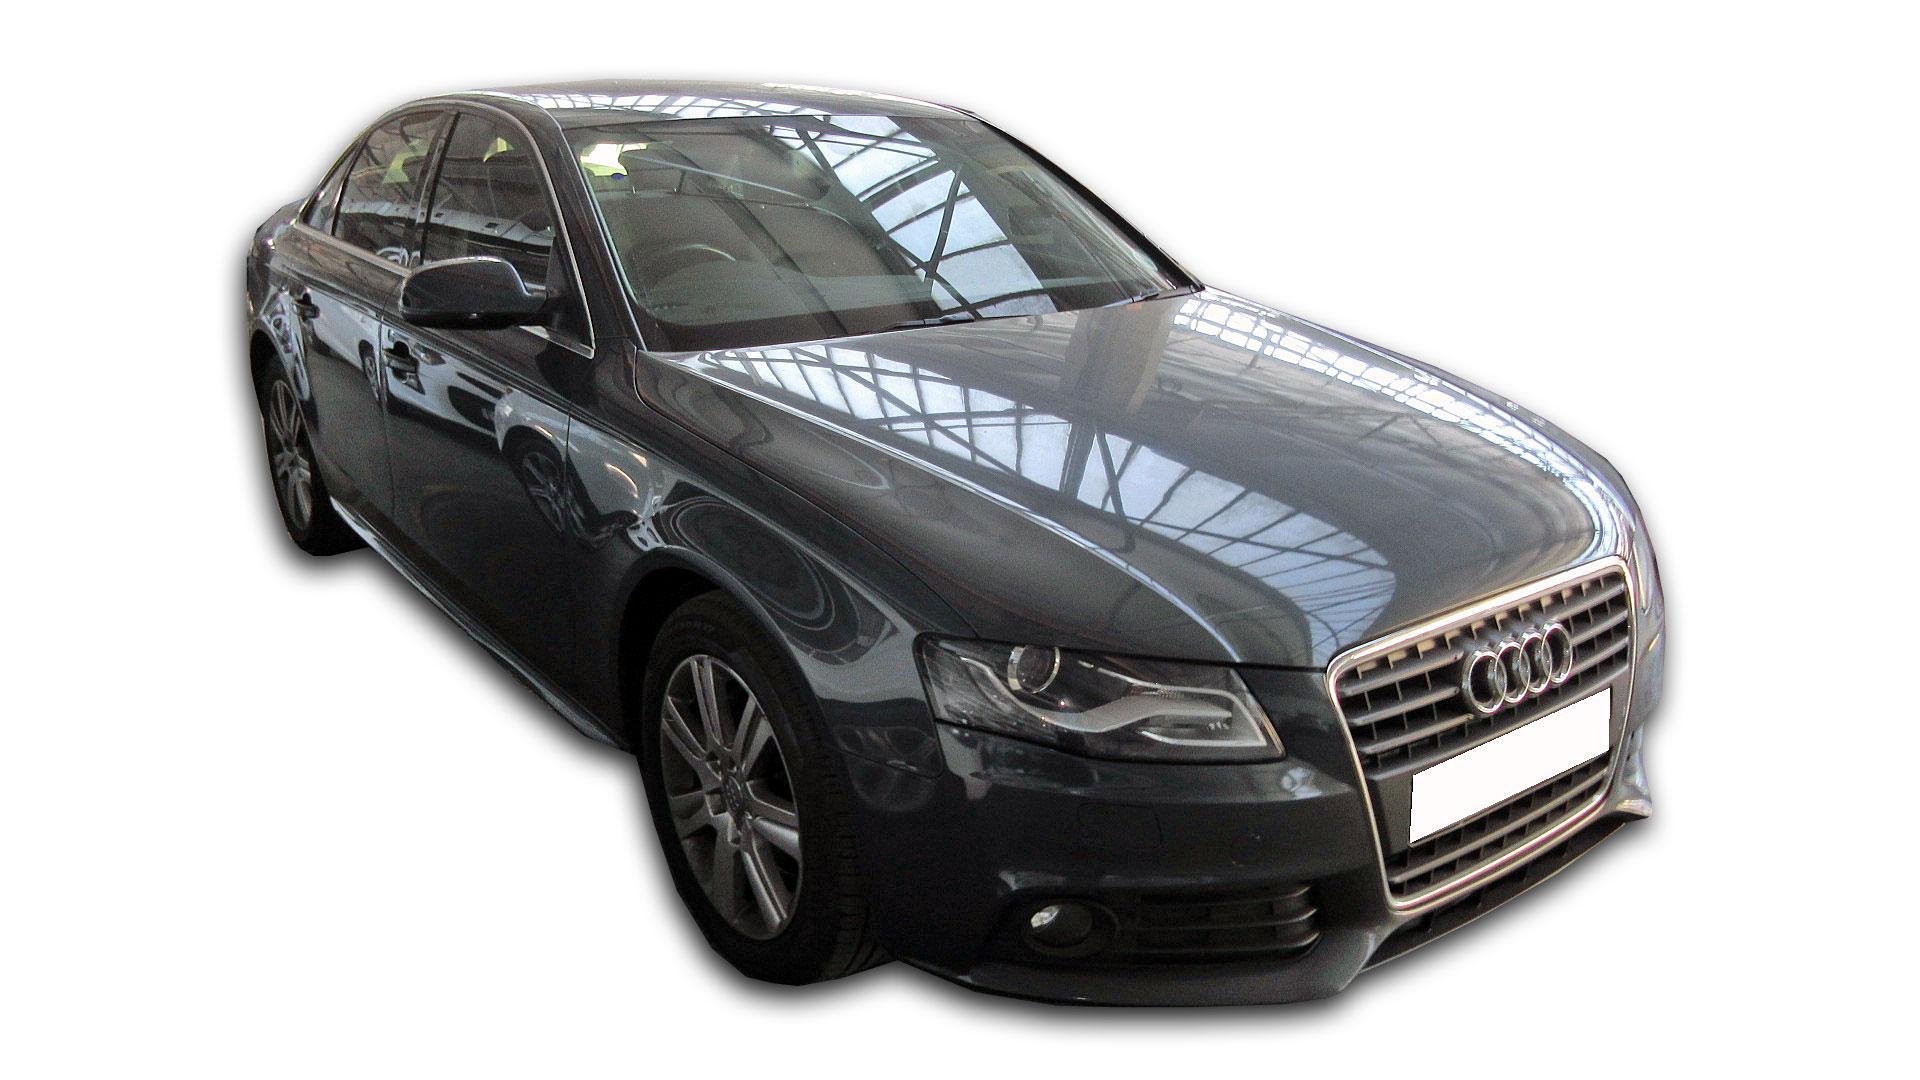 Audi A4 2.0 T Ambition (B8)